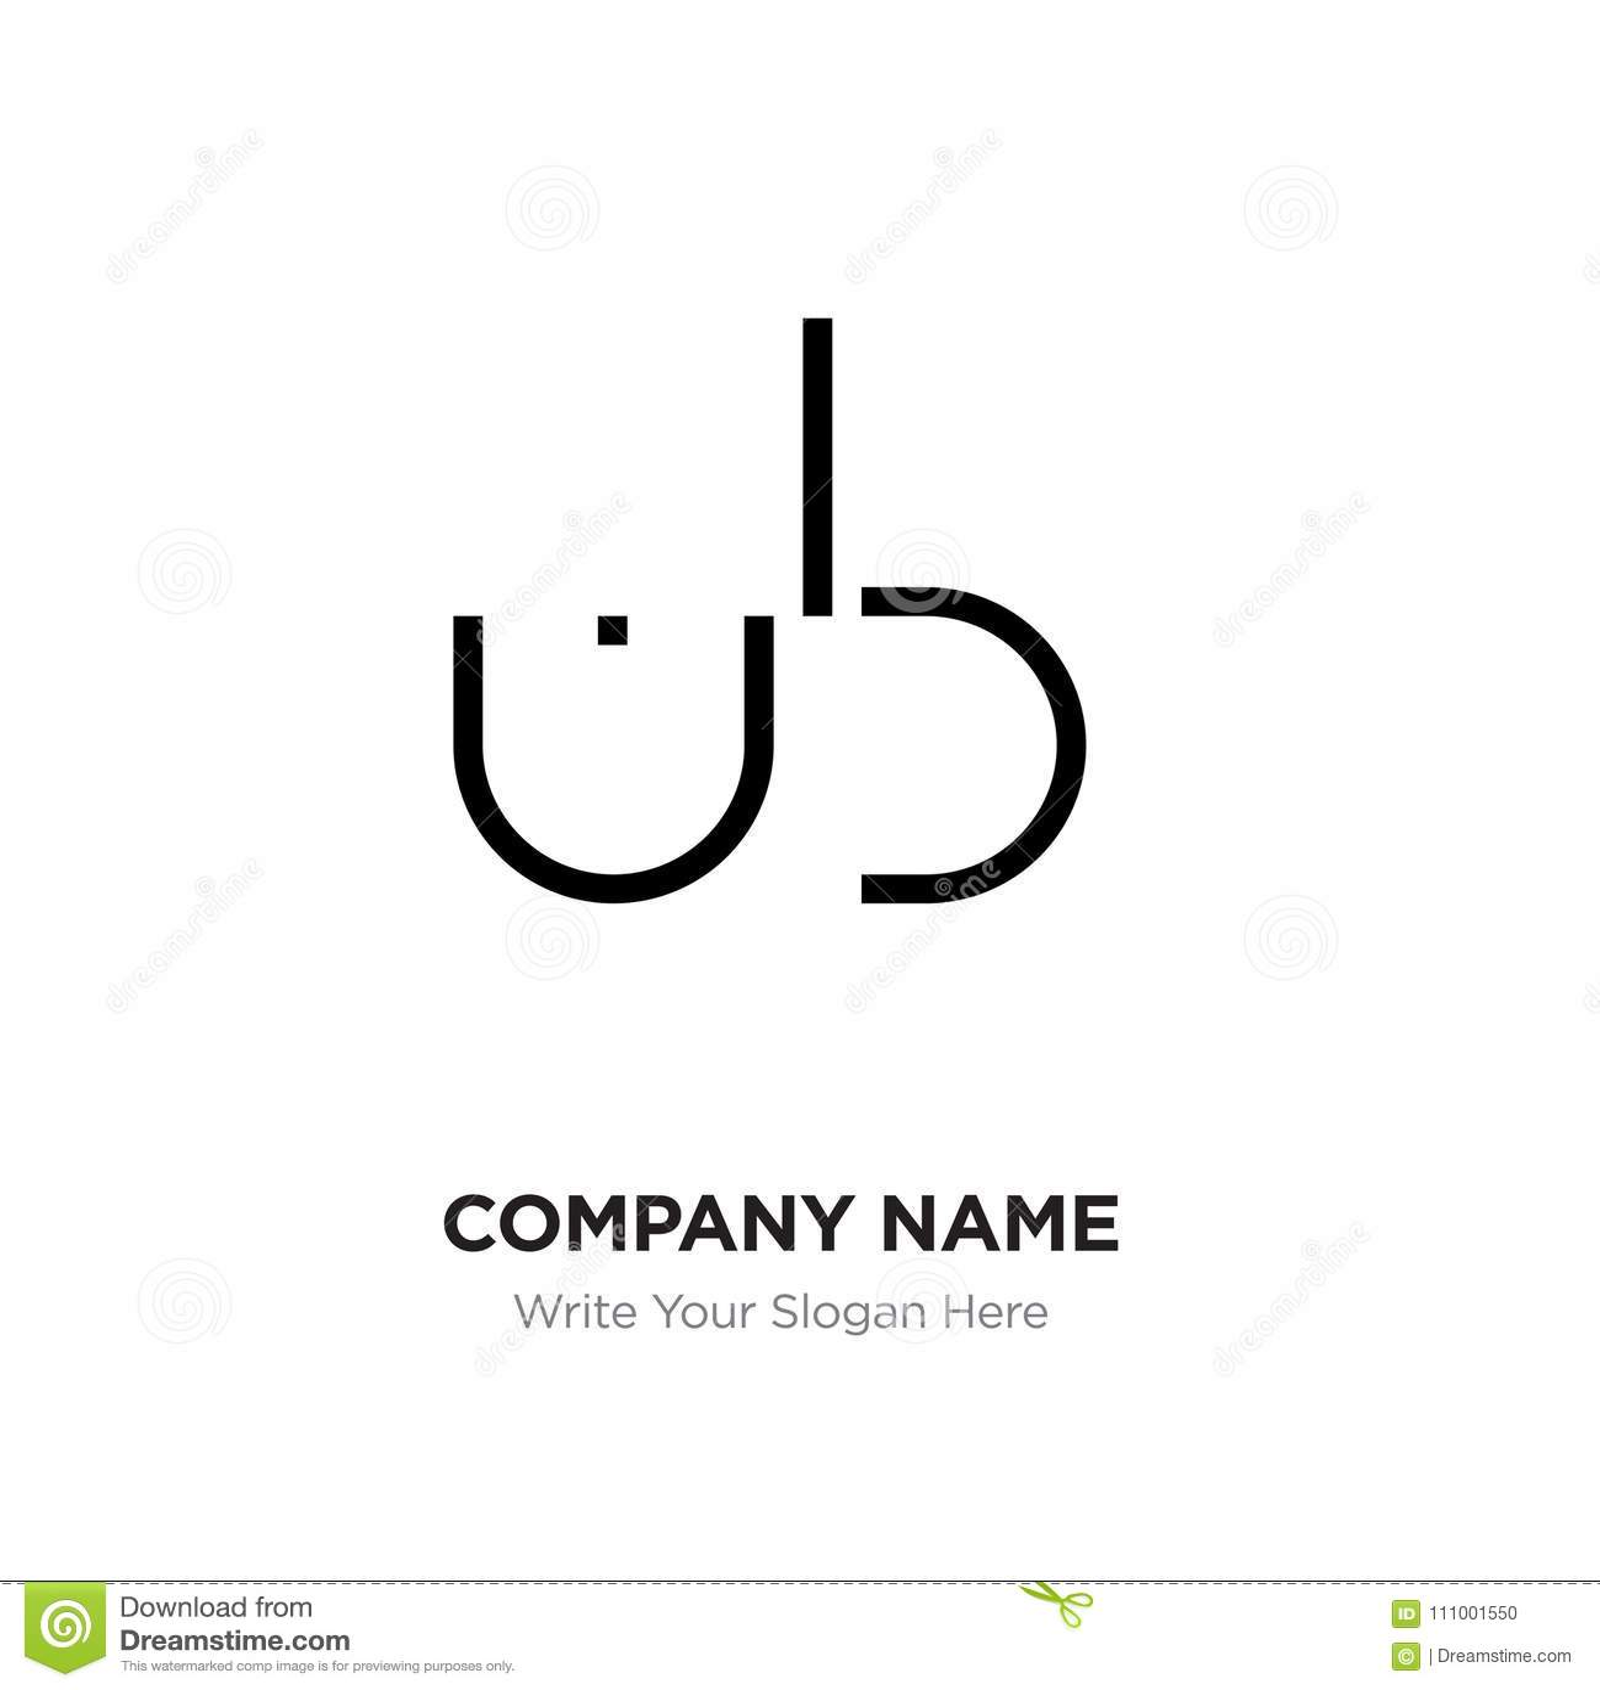 abstract letter bu,ub logo design template, black alphabet initi, Ub Presentation Template, Presentation templates